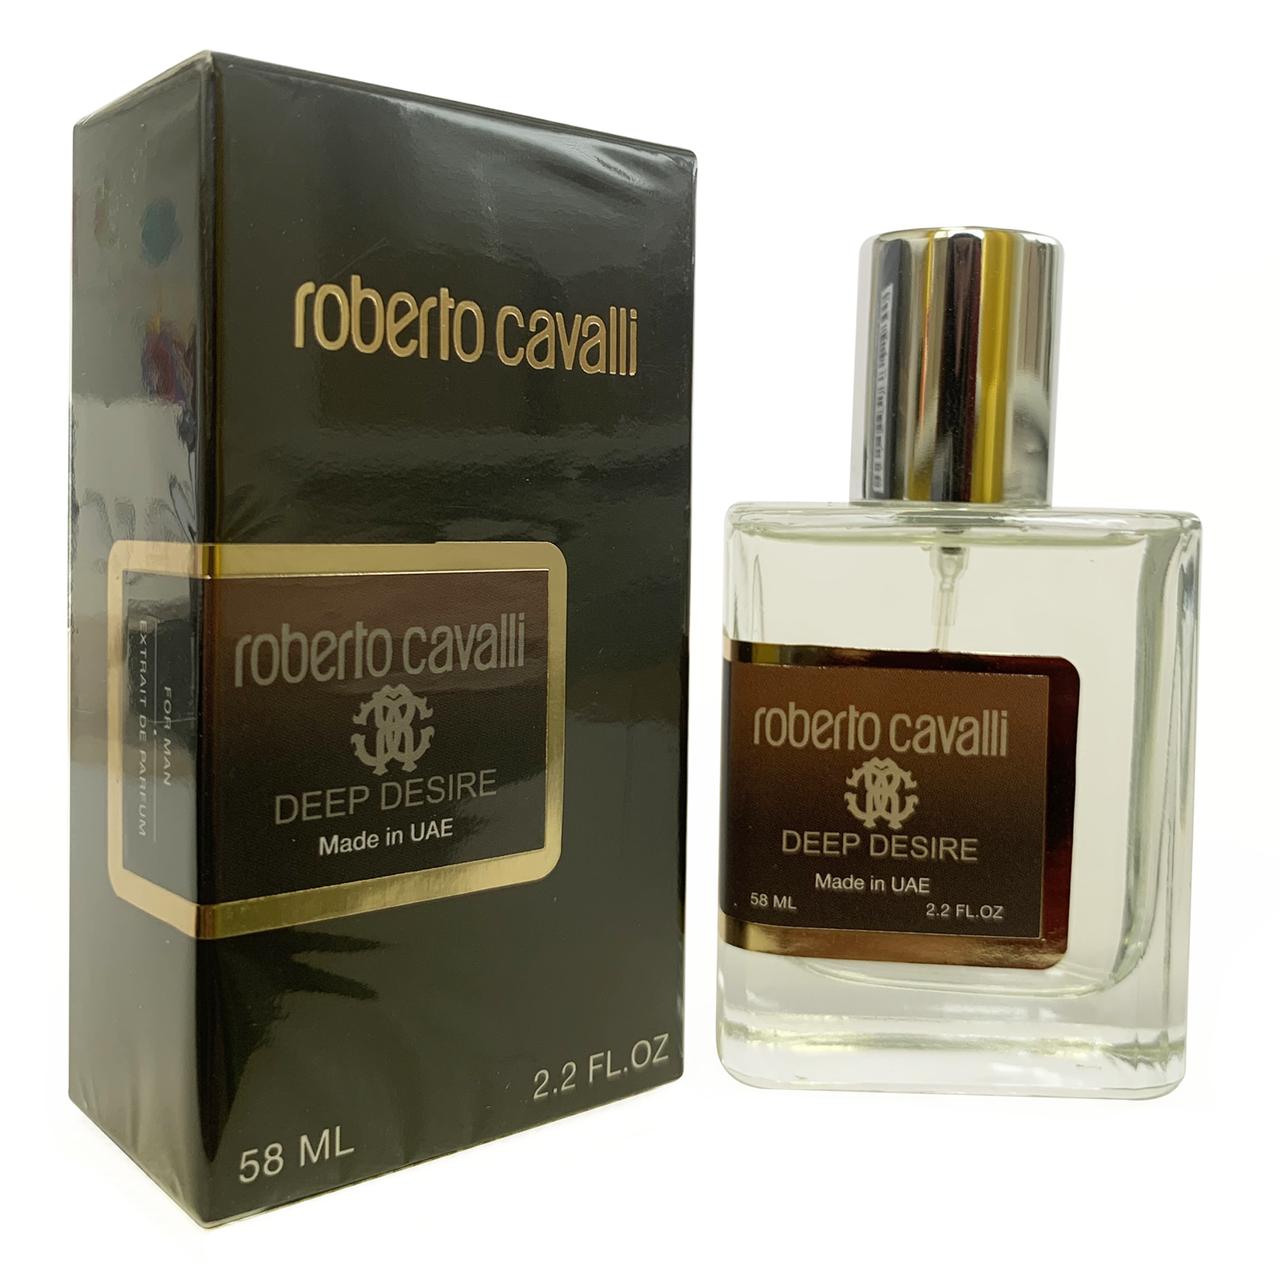 Roberto Cavalli Uomo Deep Desire Perfume Newly мужской, 58 мл